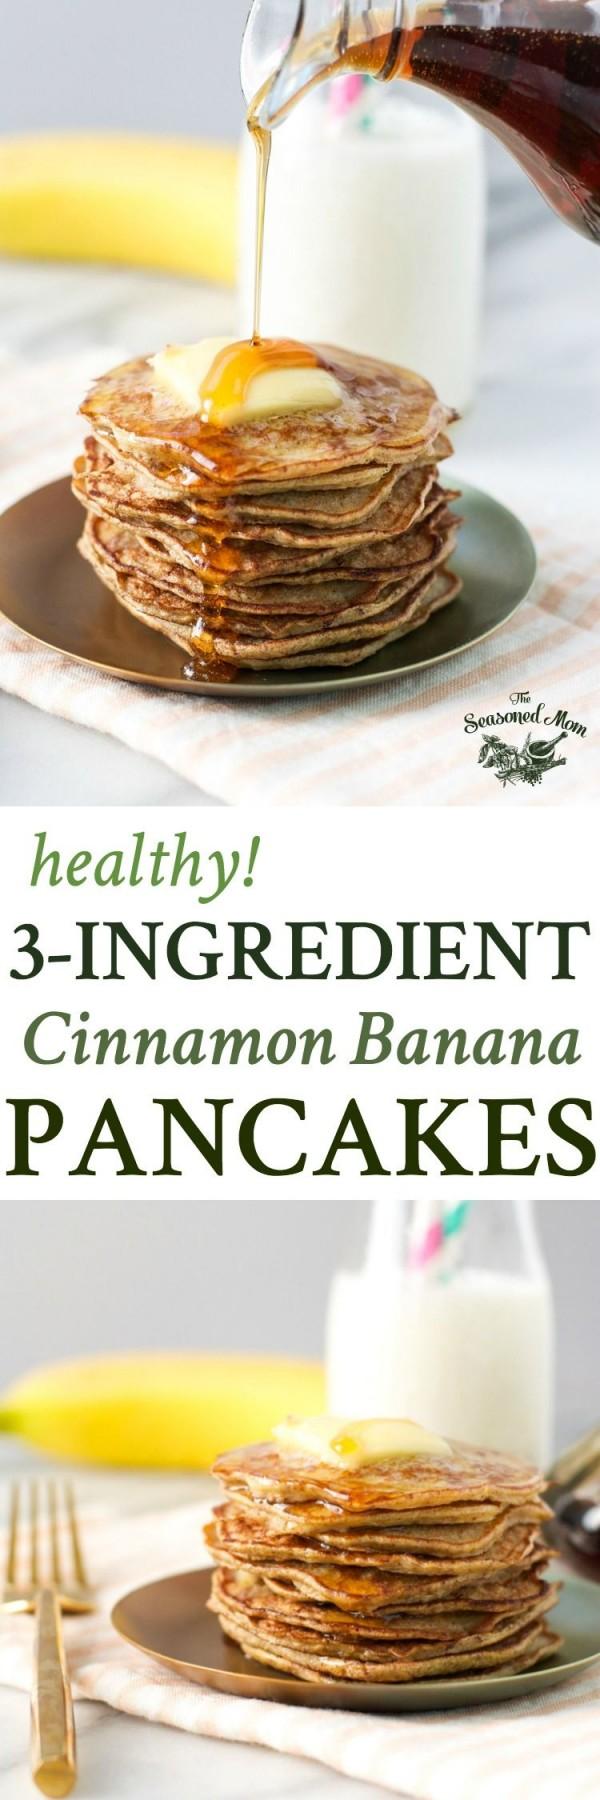 Check out this recipe for breakfast banana pancakes. Yummy! #RecipeIdeas @recipes_to_go